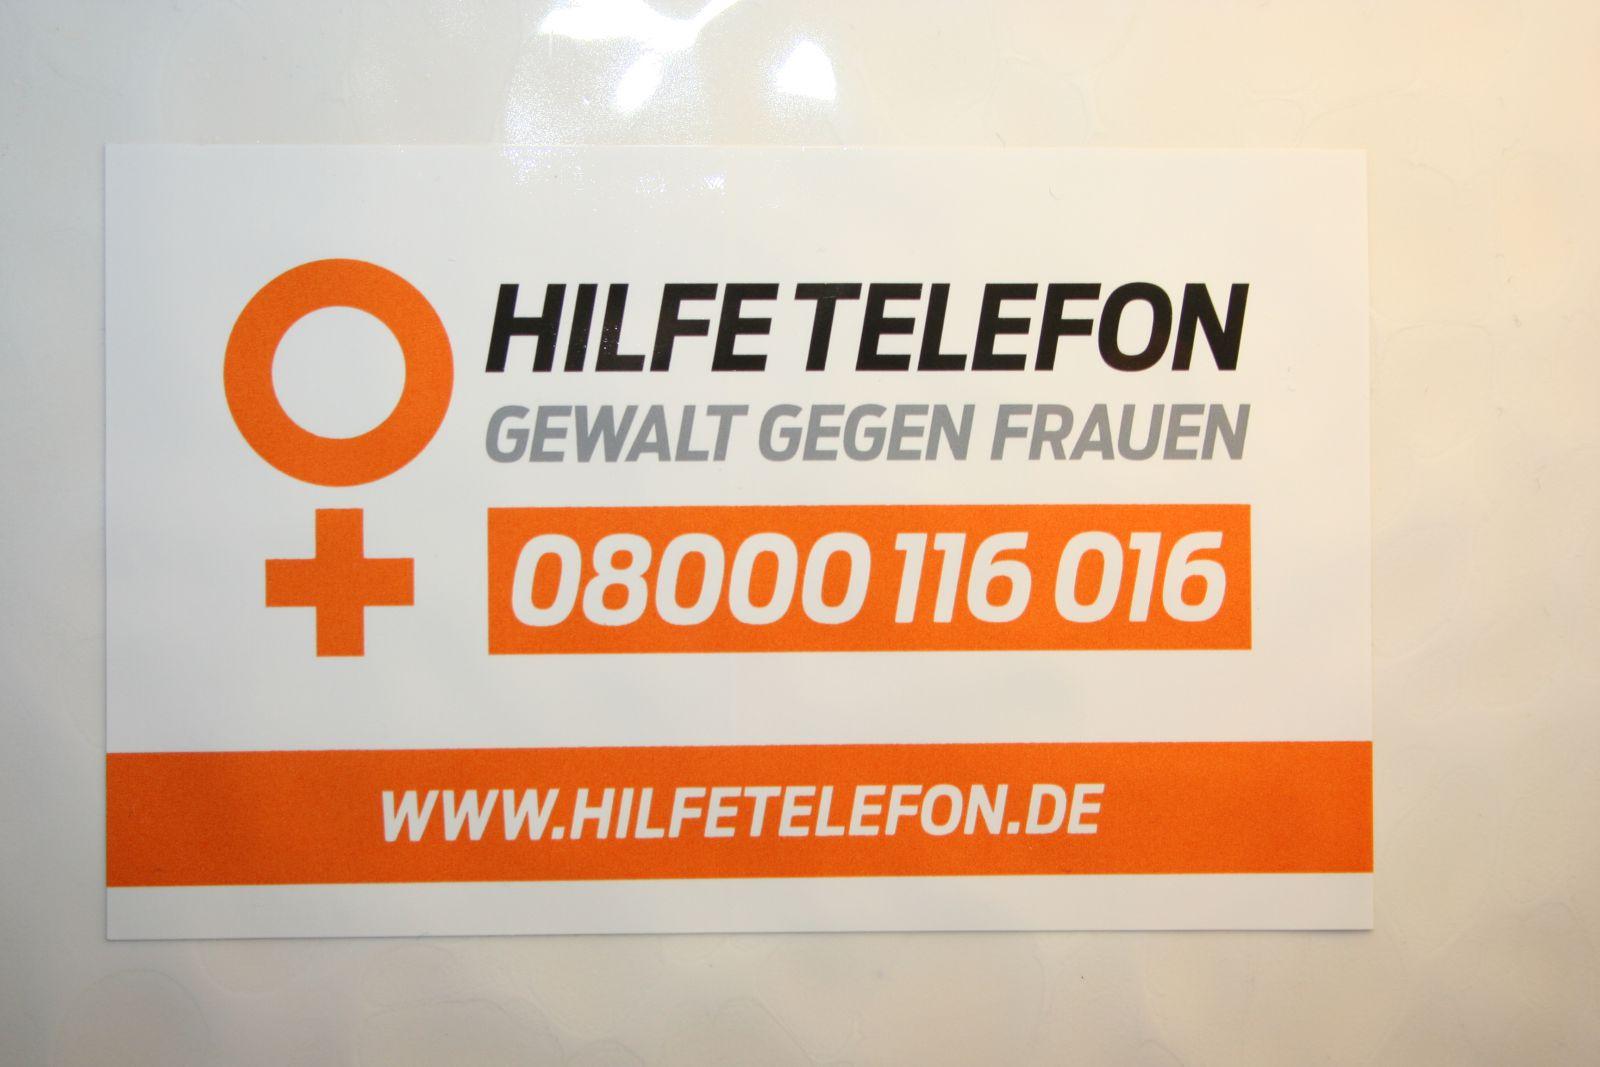 aufkleber_hilfetelefon-010